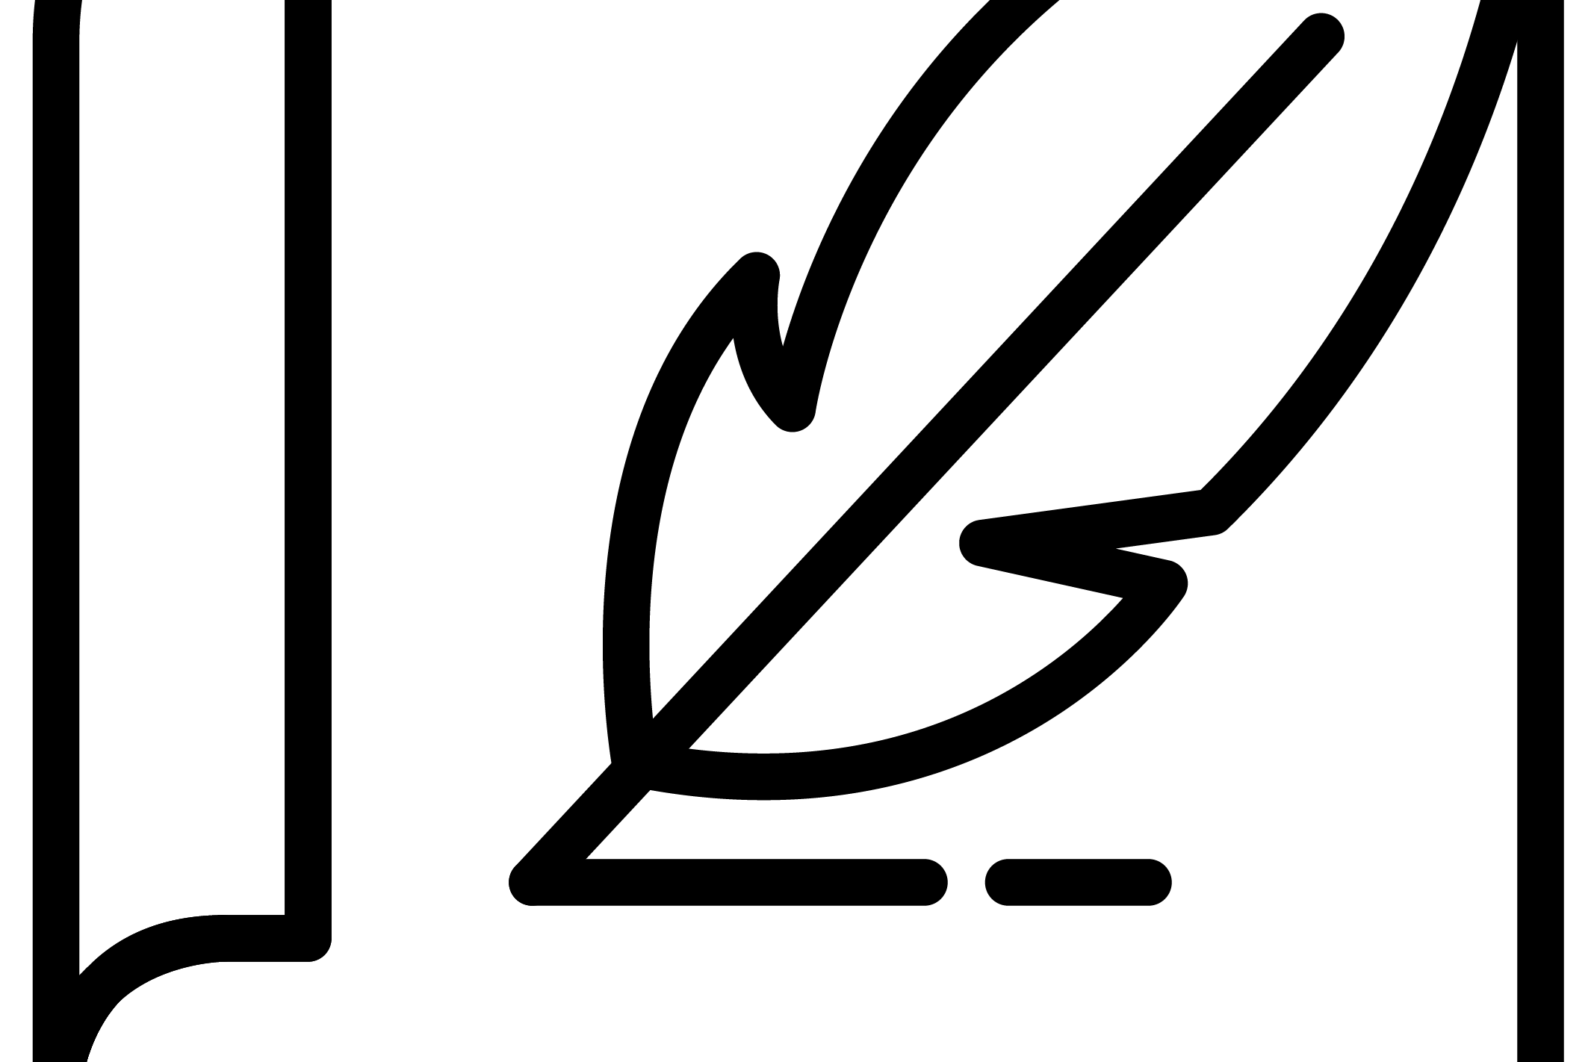 Outline : Scrolls Icon set - LKJN 01 01 -